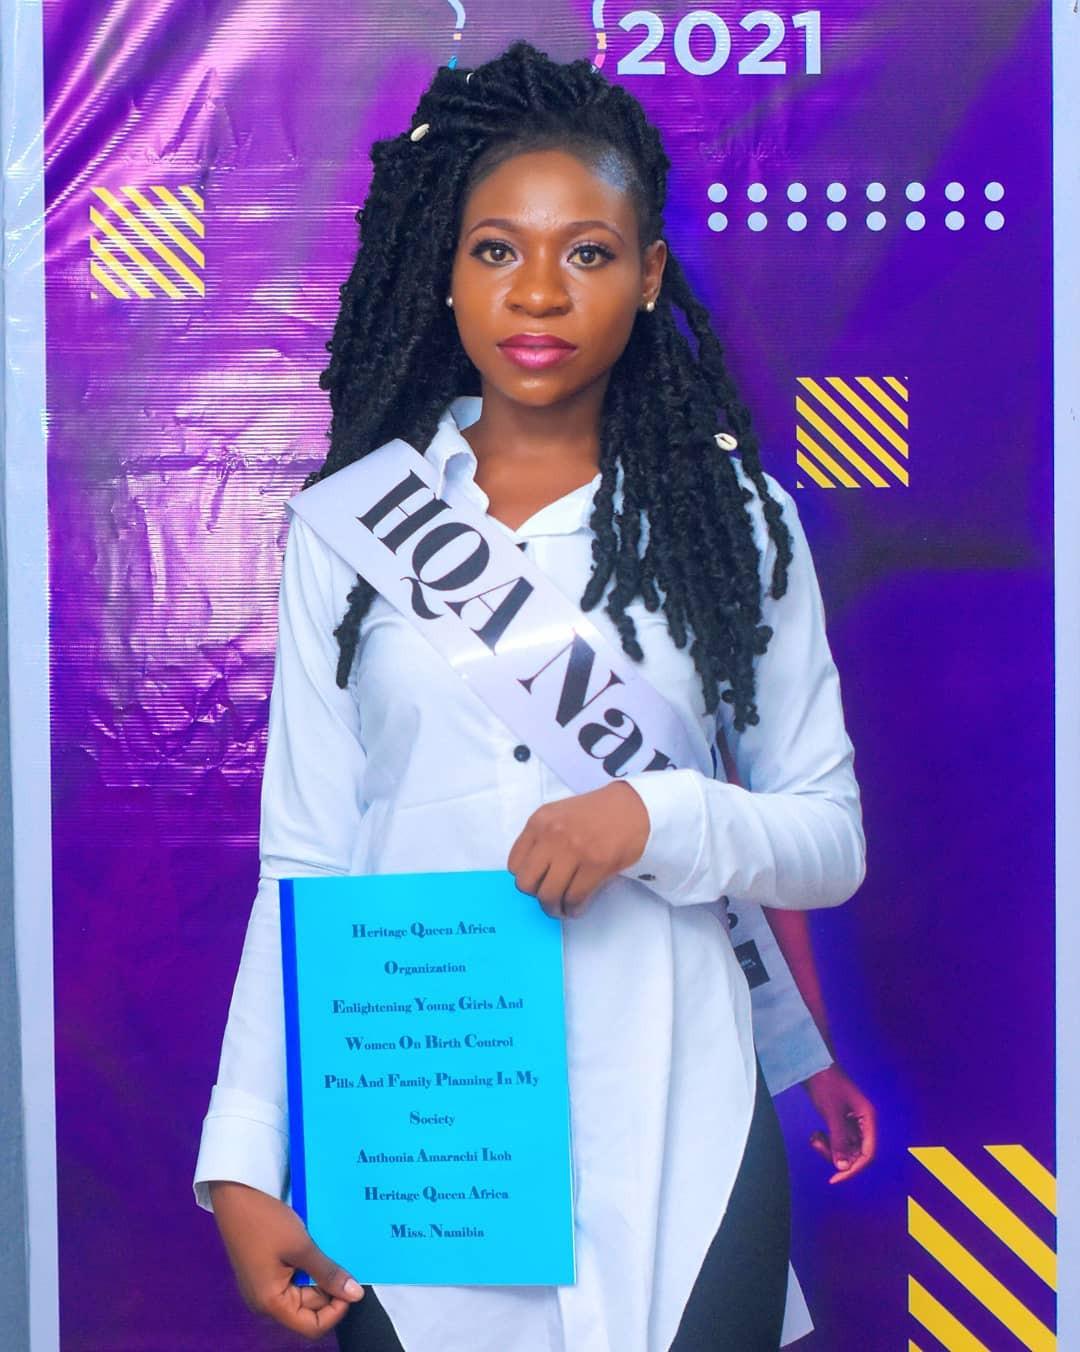 candidatas a heritage queen africa 2021. final: 19 june. - Página 5 NPKsIe